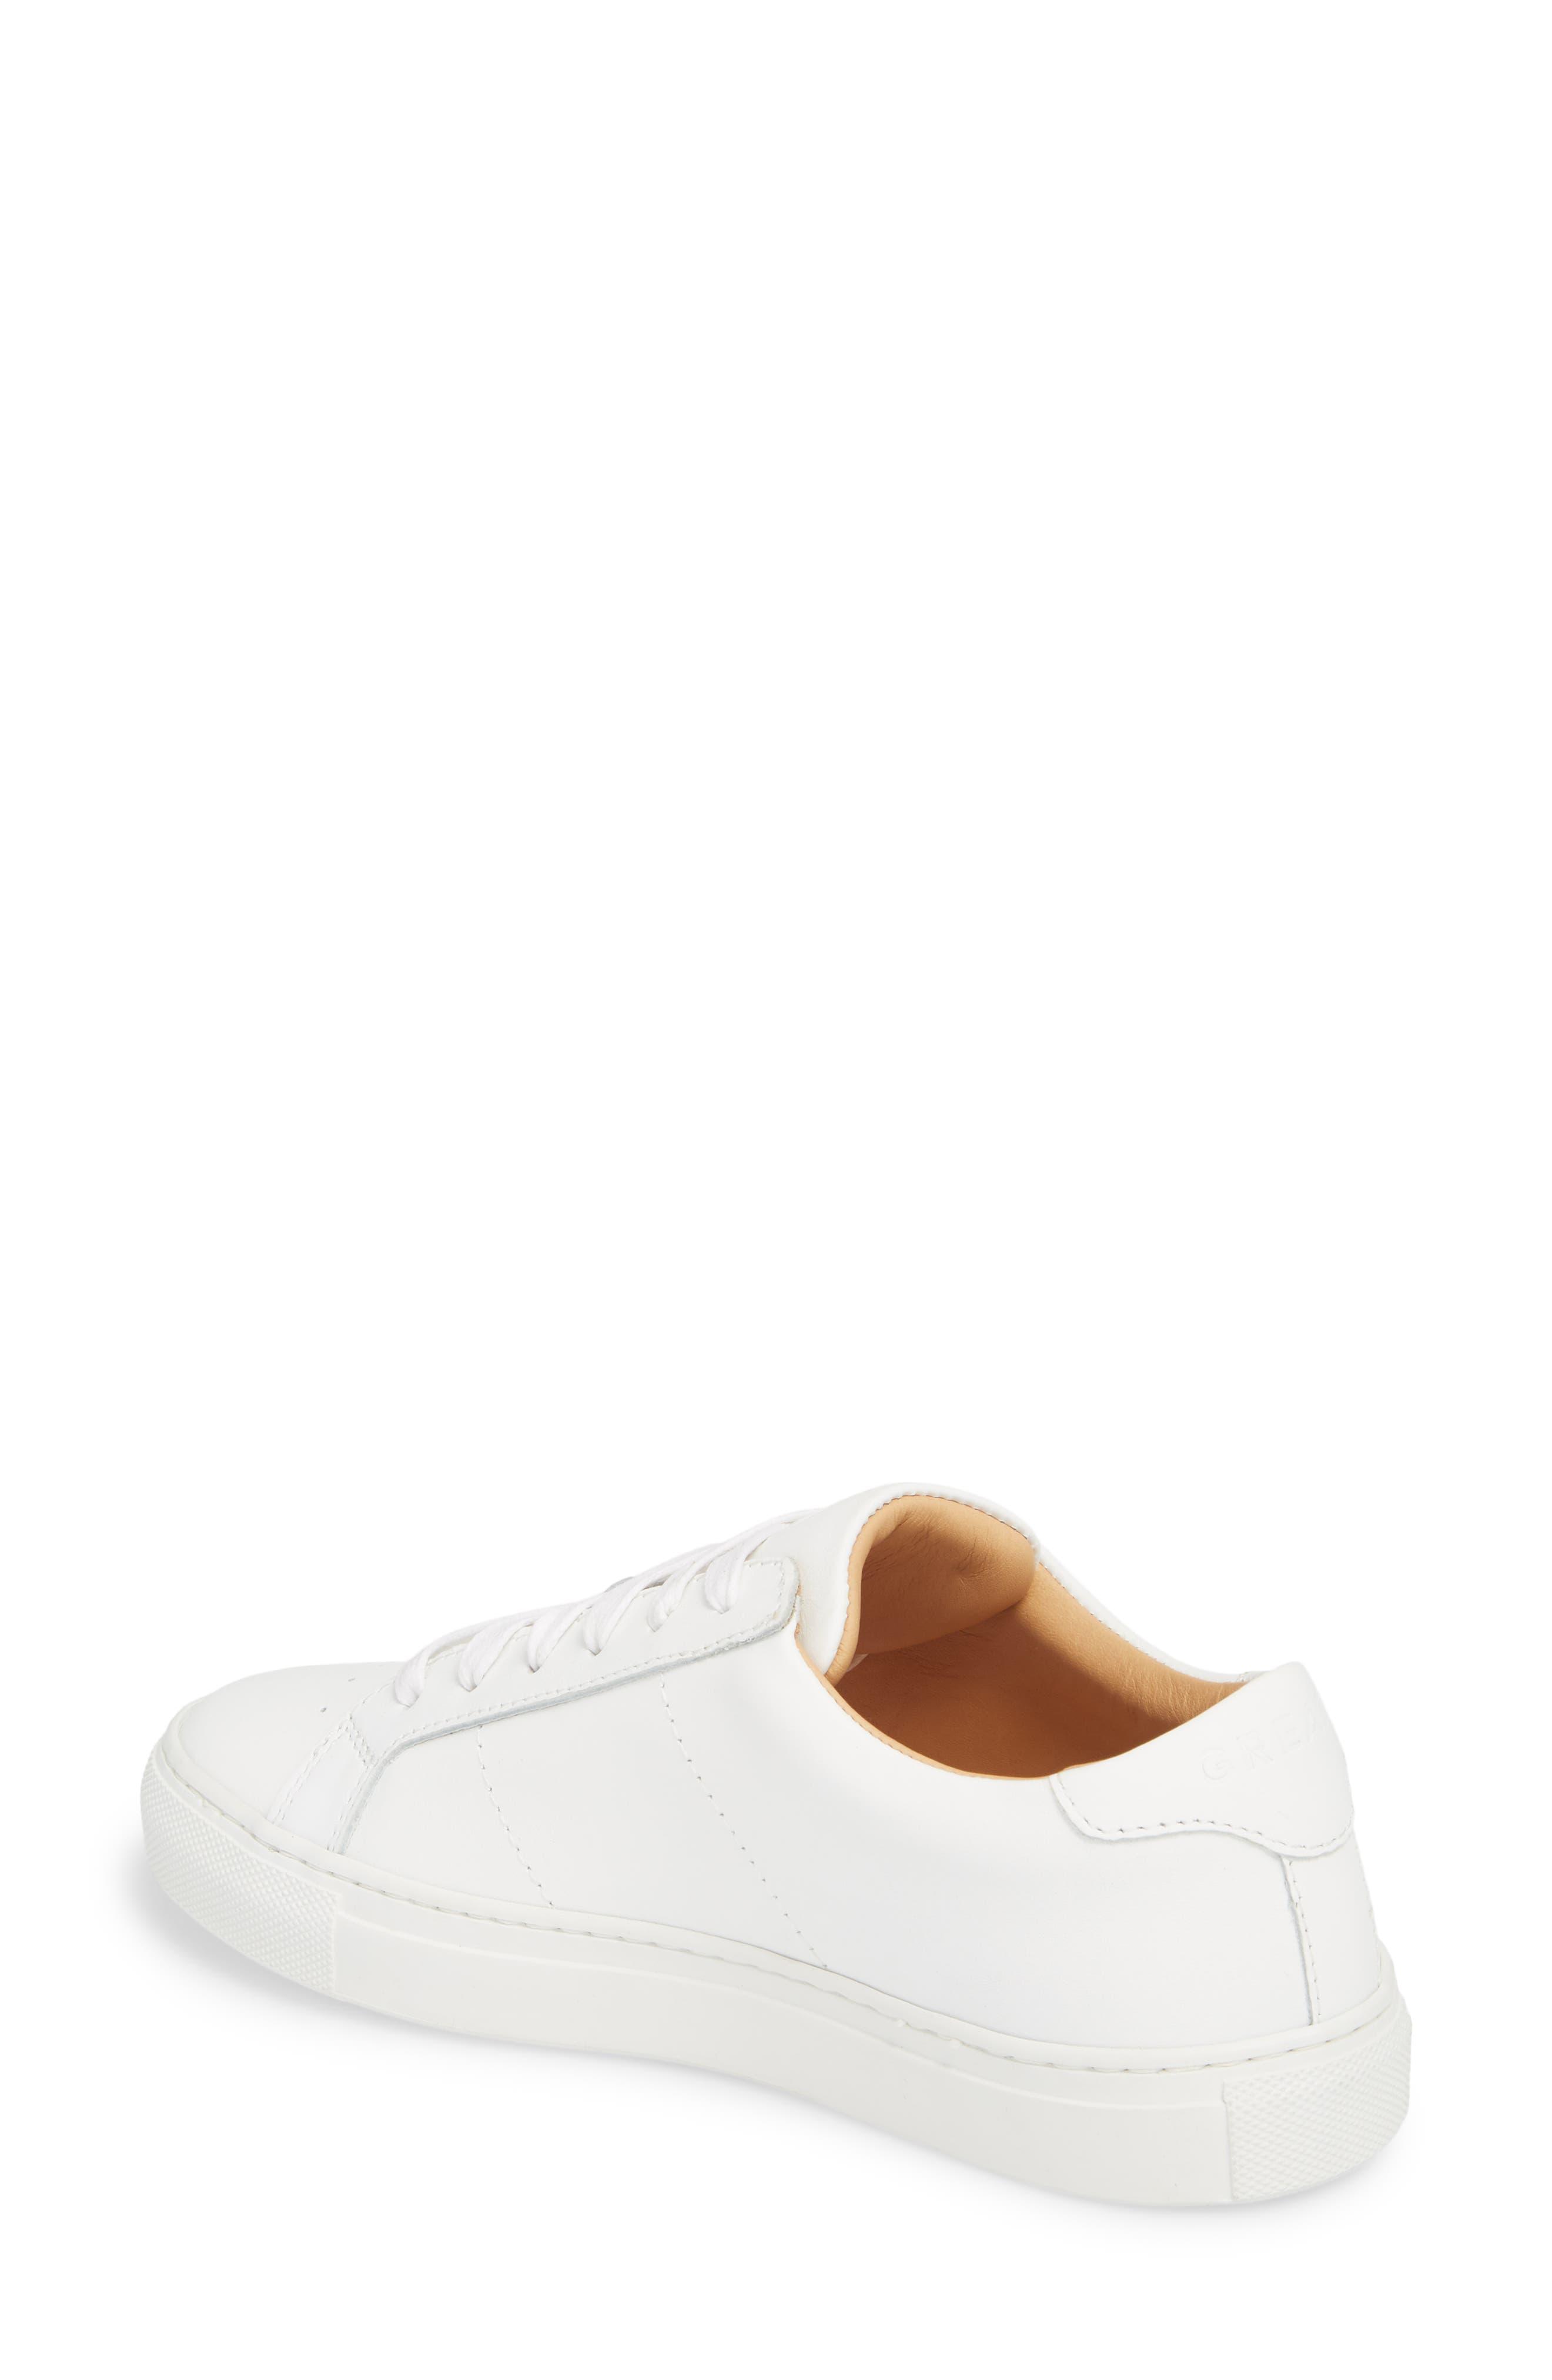 Royale Sneaker,                             Alternate thumbnail 2, color,